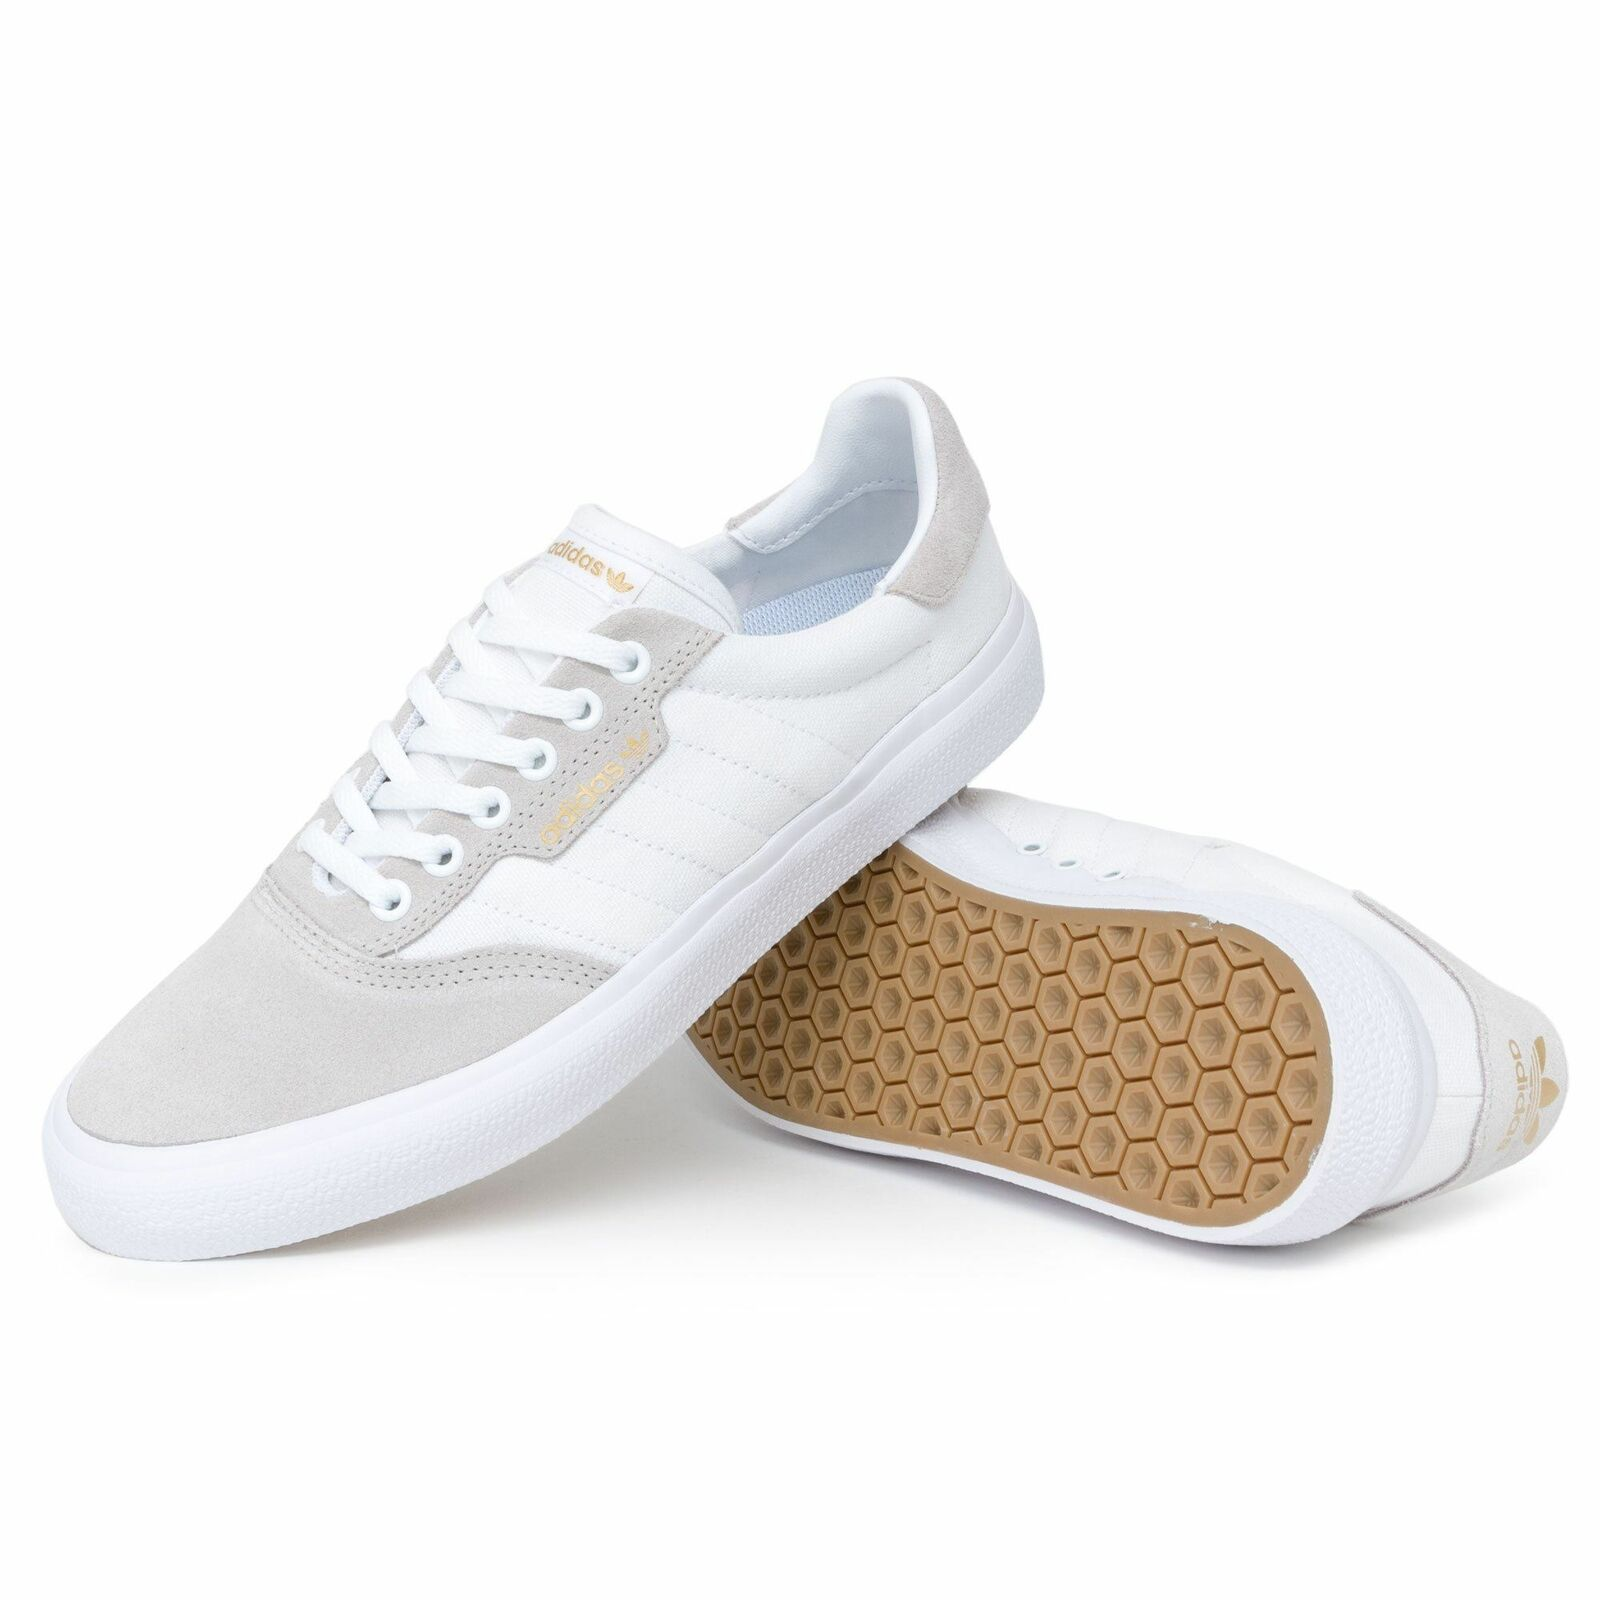 Adidas 3MC Vulc Originals Schuhe Herren Weiß Gold Metal